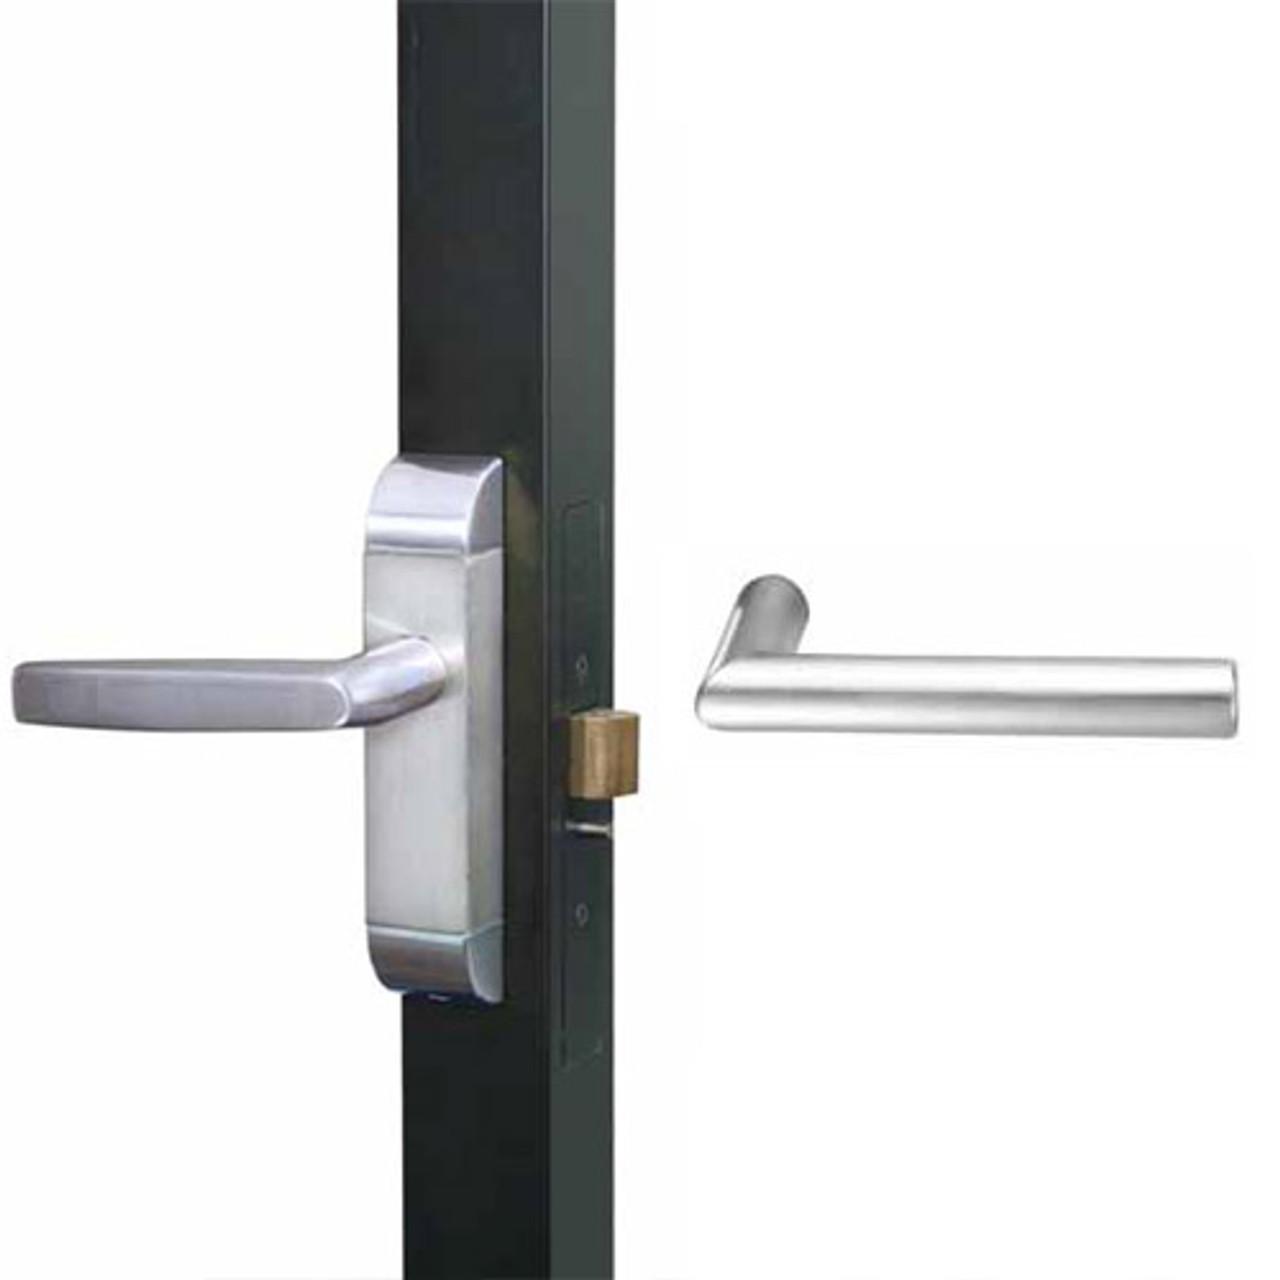 4600-MI-622-US32 Adams Rite MI Designer Deadlatch handle in Bright Stainless Finish